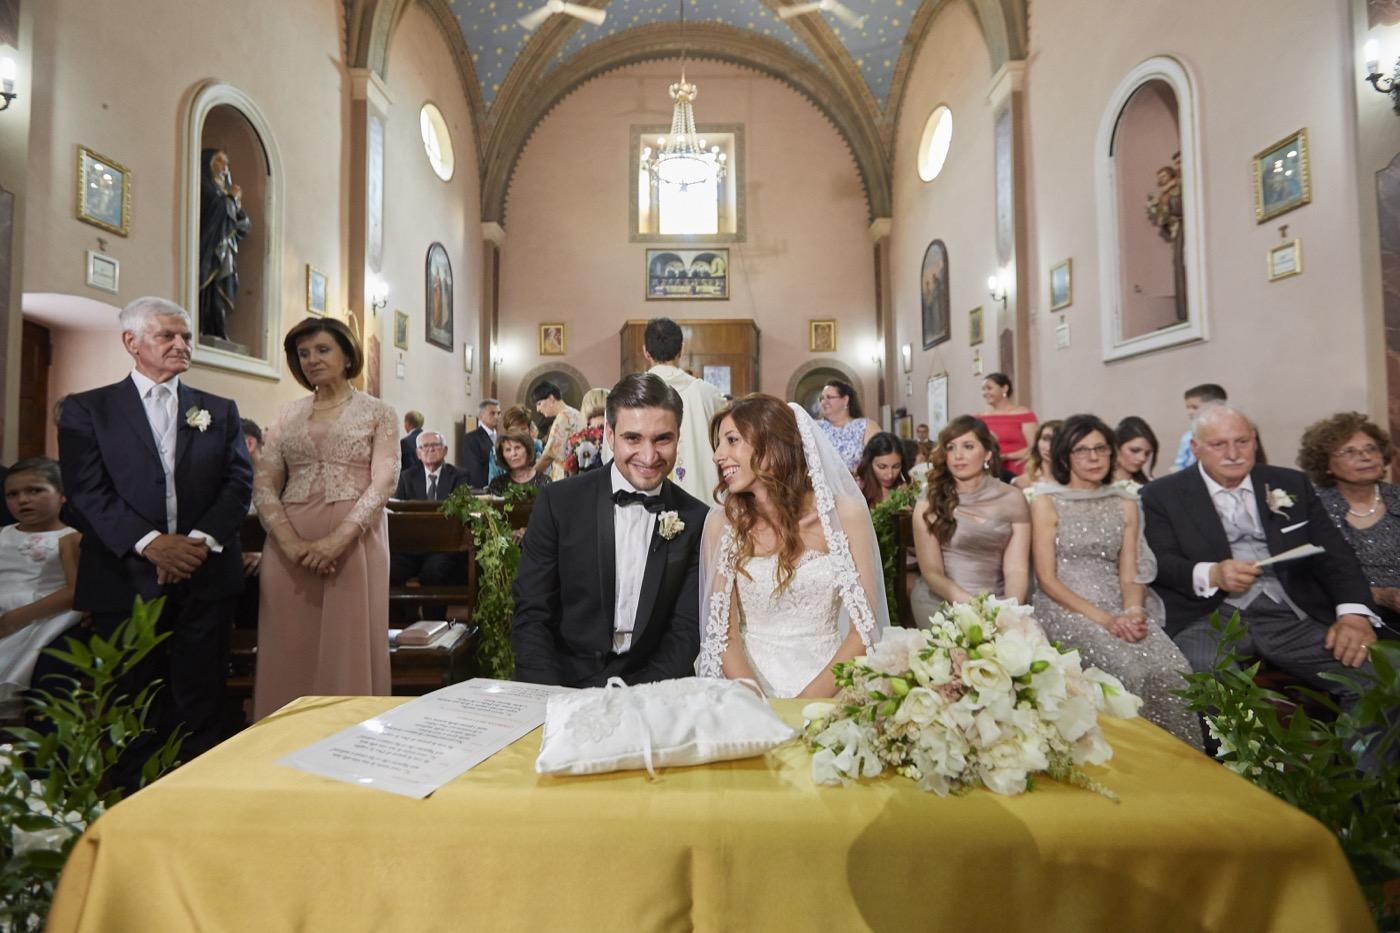 Claudio-Coppola-wedding-photographer-abbazia-7-frati-piegaro-53